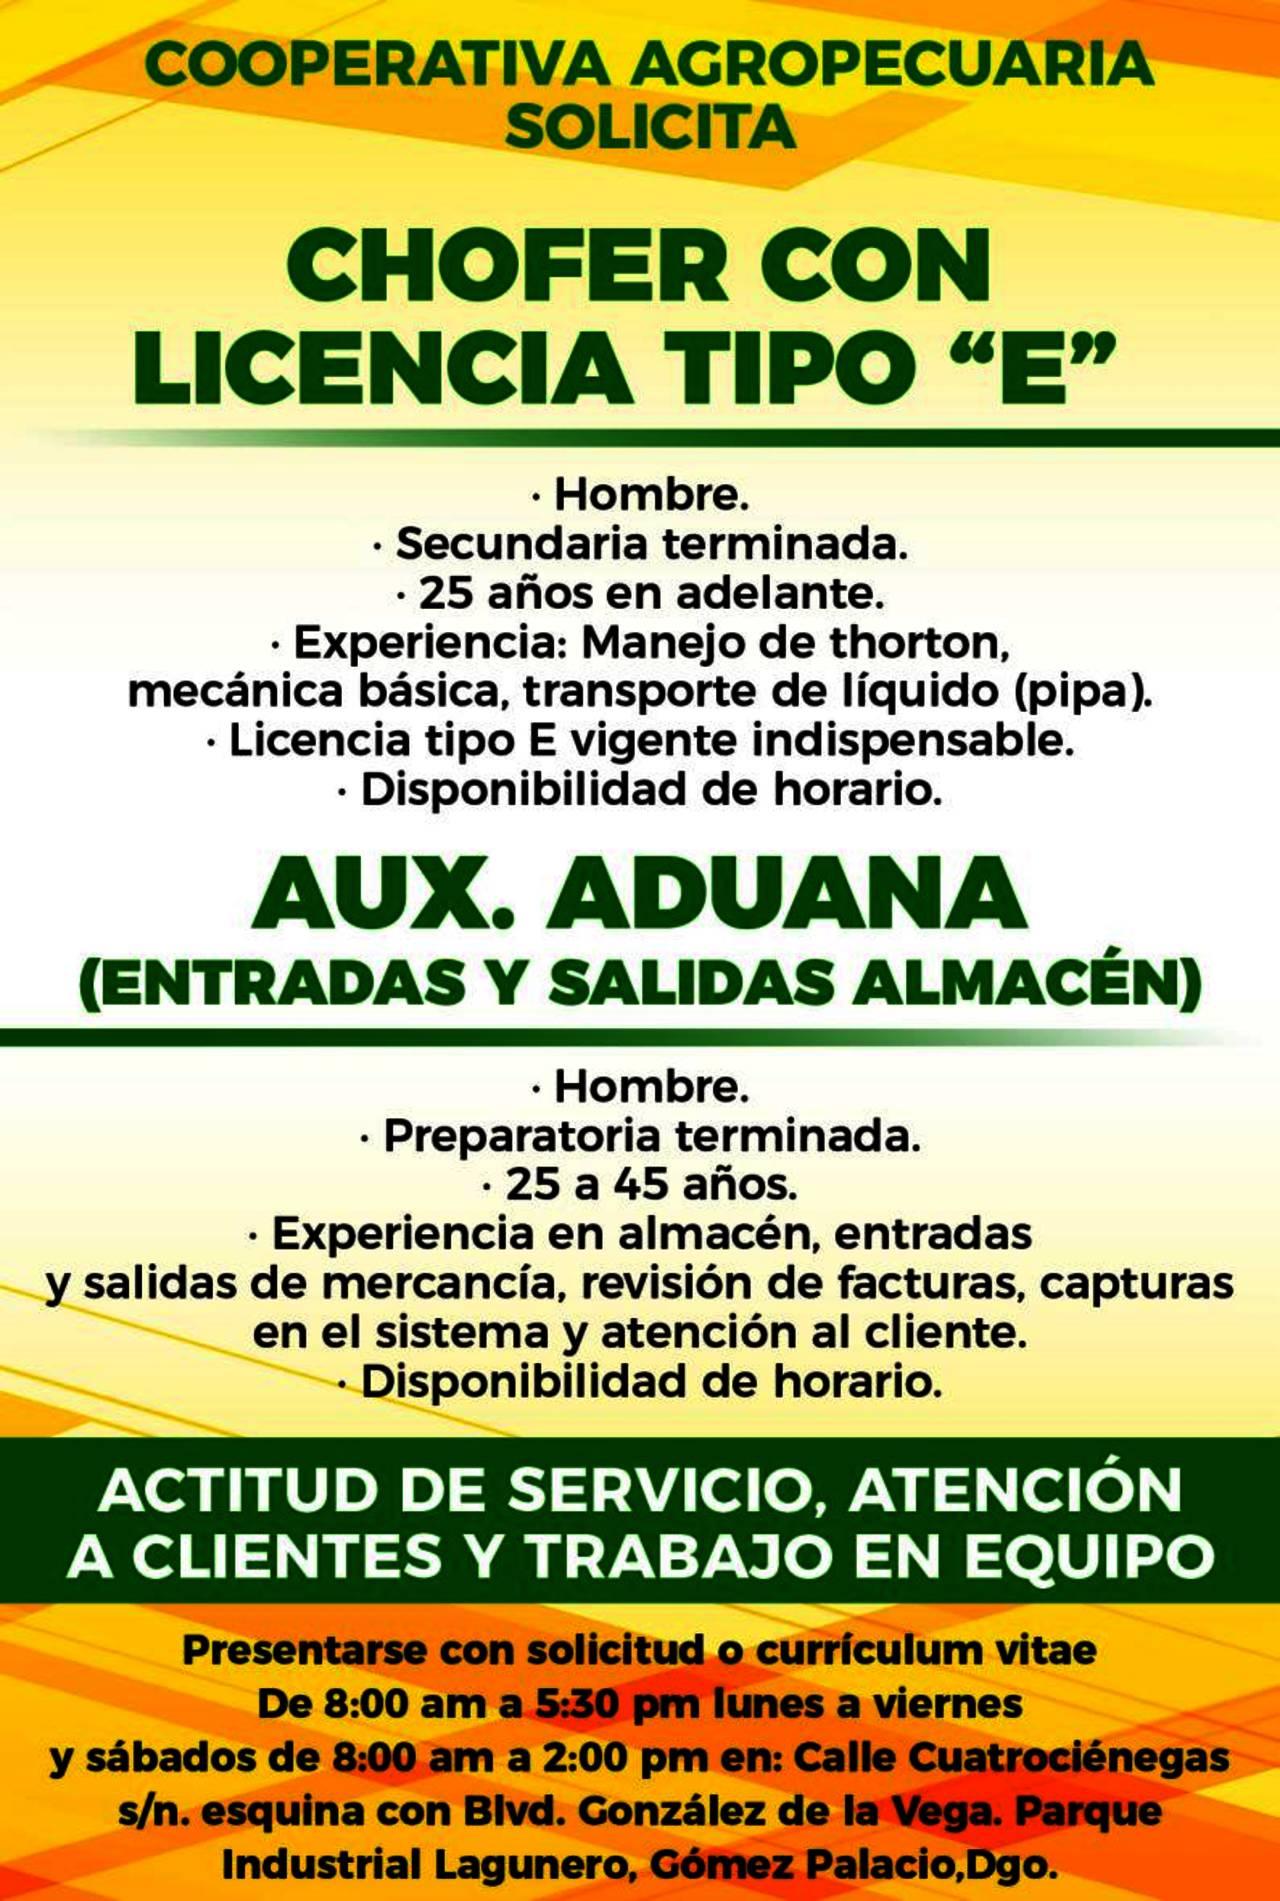 EMPLEO: COOPERATIVA AGROPECUARIA - Torreón desplegados El Siglo